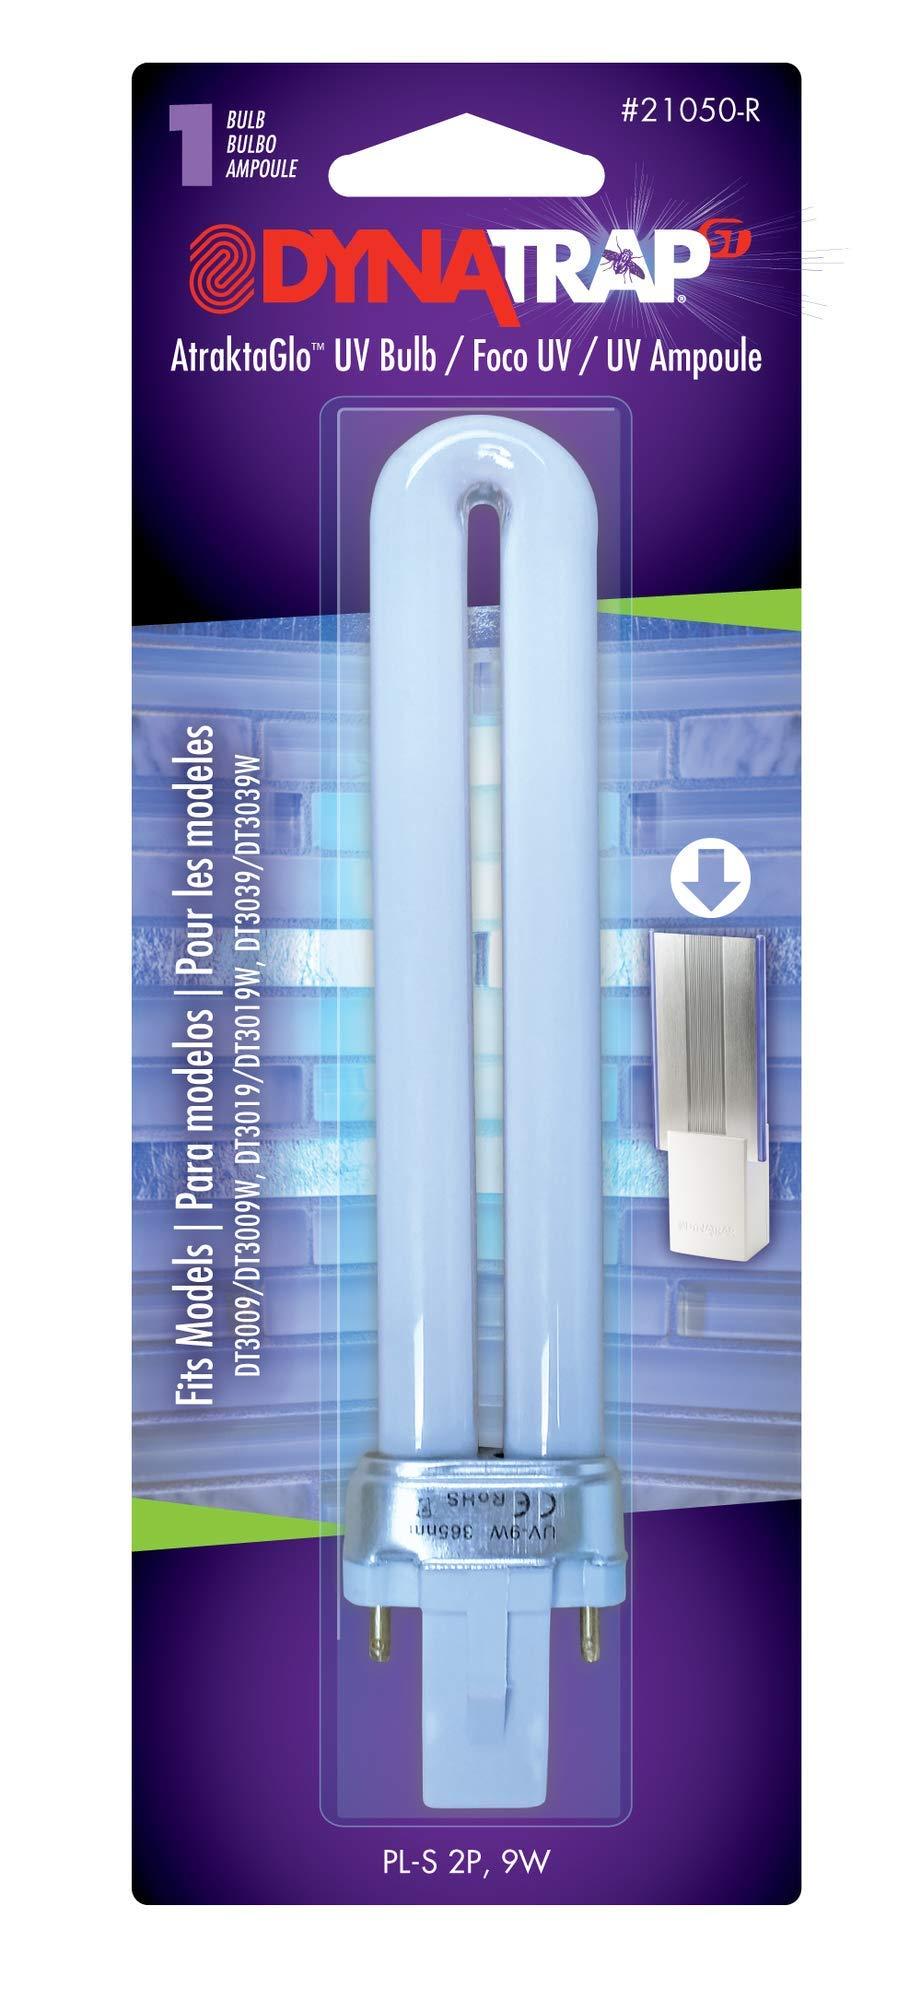 DynaTrap 21050 Indoor Insect Trap, DT3039 AtraktaGlo 9-Watt UV Bulb for FlyLight Models DT3009, DT3019, Plain by DynaTrap